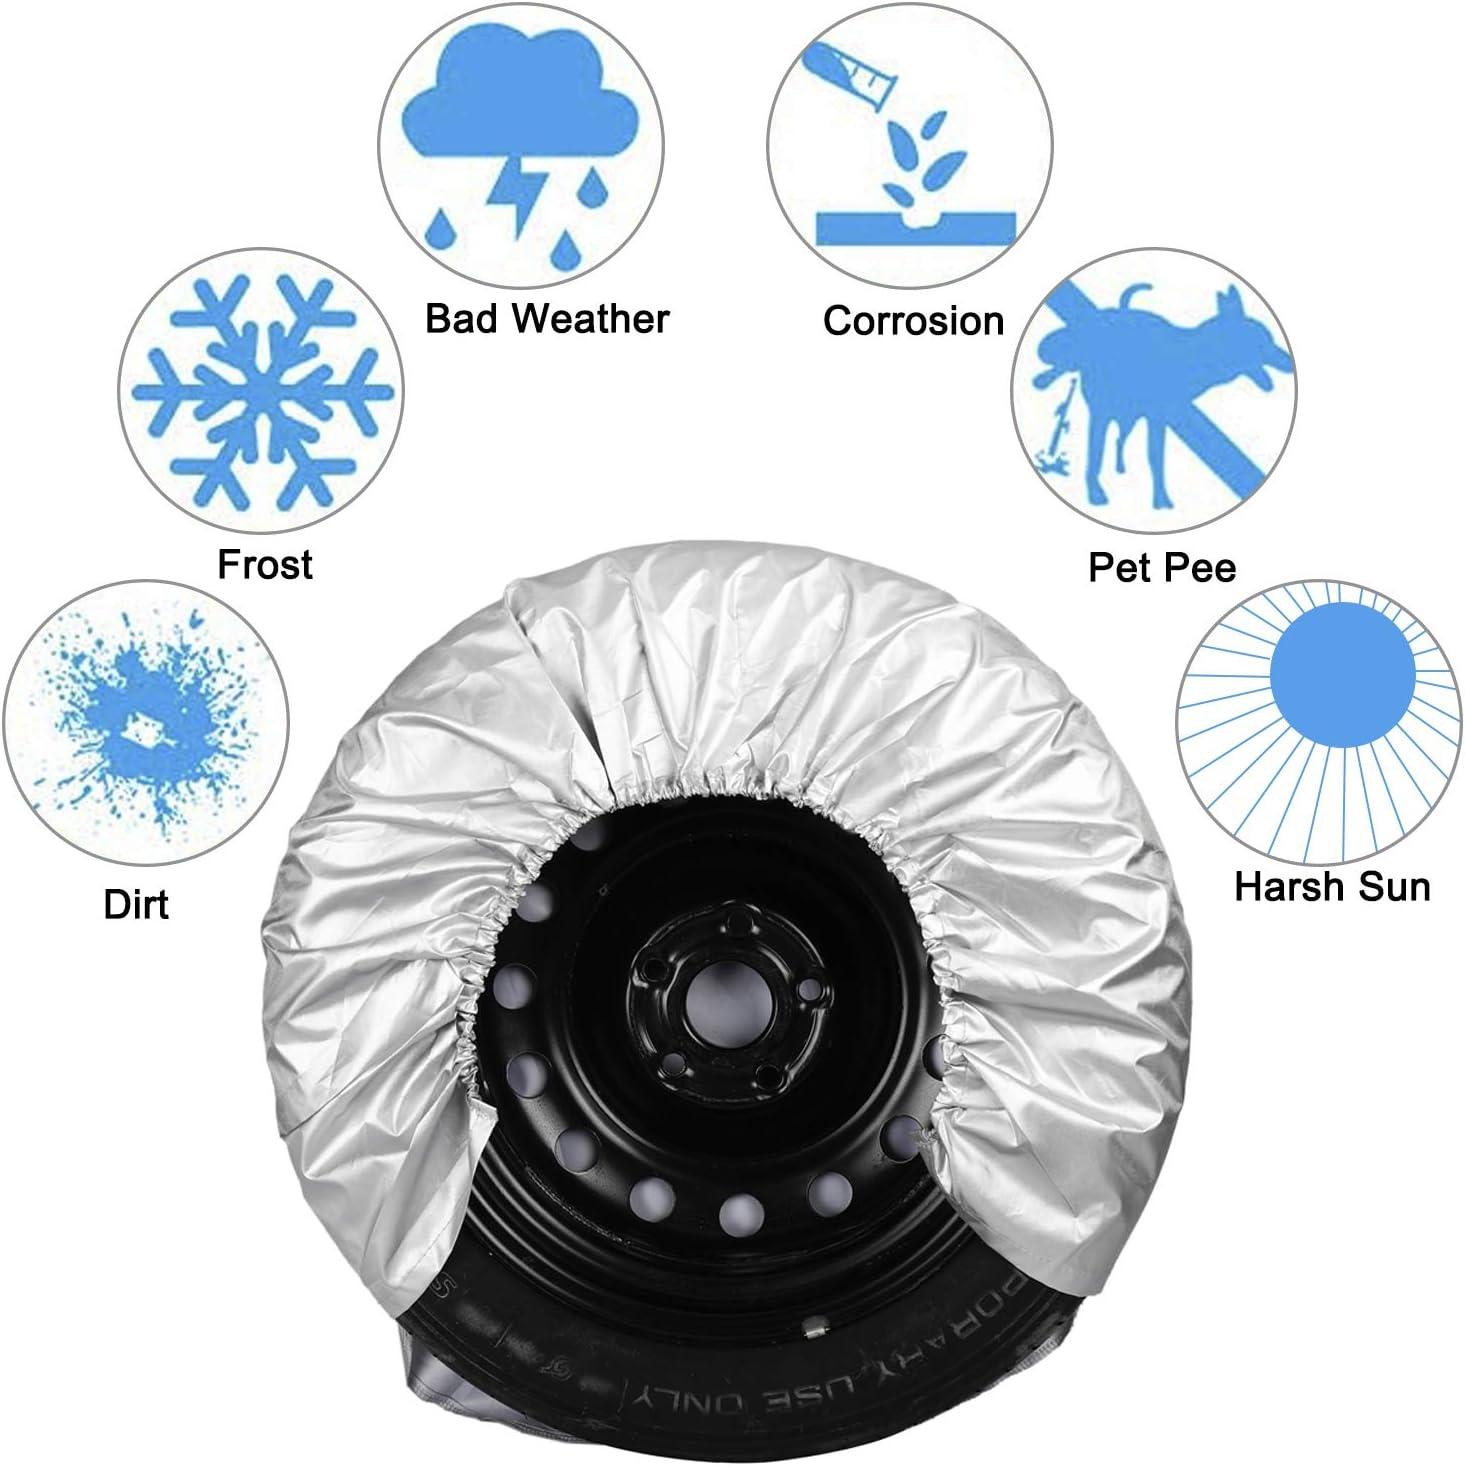 Set of 4 Motorhome Wheel Tire Covers Waterproof Sun-Proof Tire Protectors for RV Auto Truck Car Camper Trailer Fits 27-29 Tire Diameters Yaegoo Tire Covers